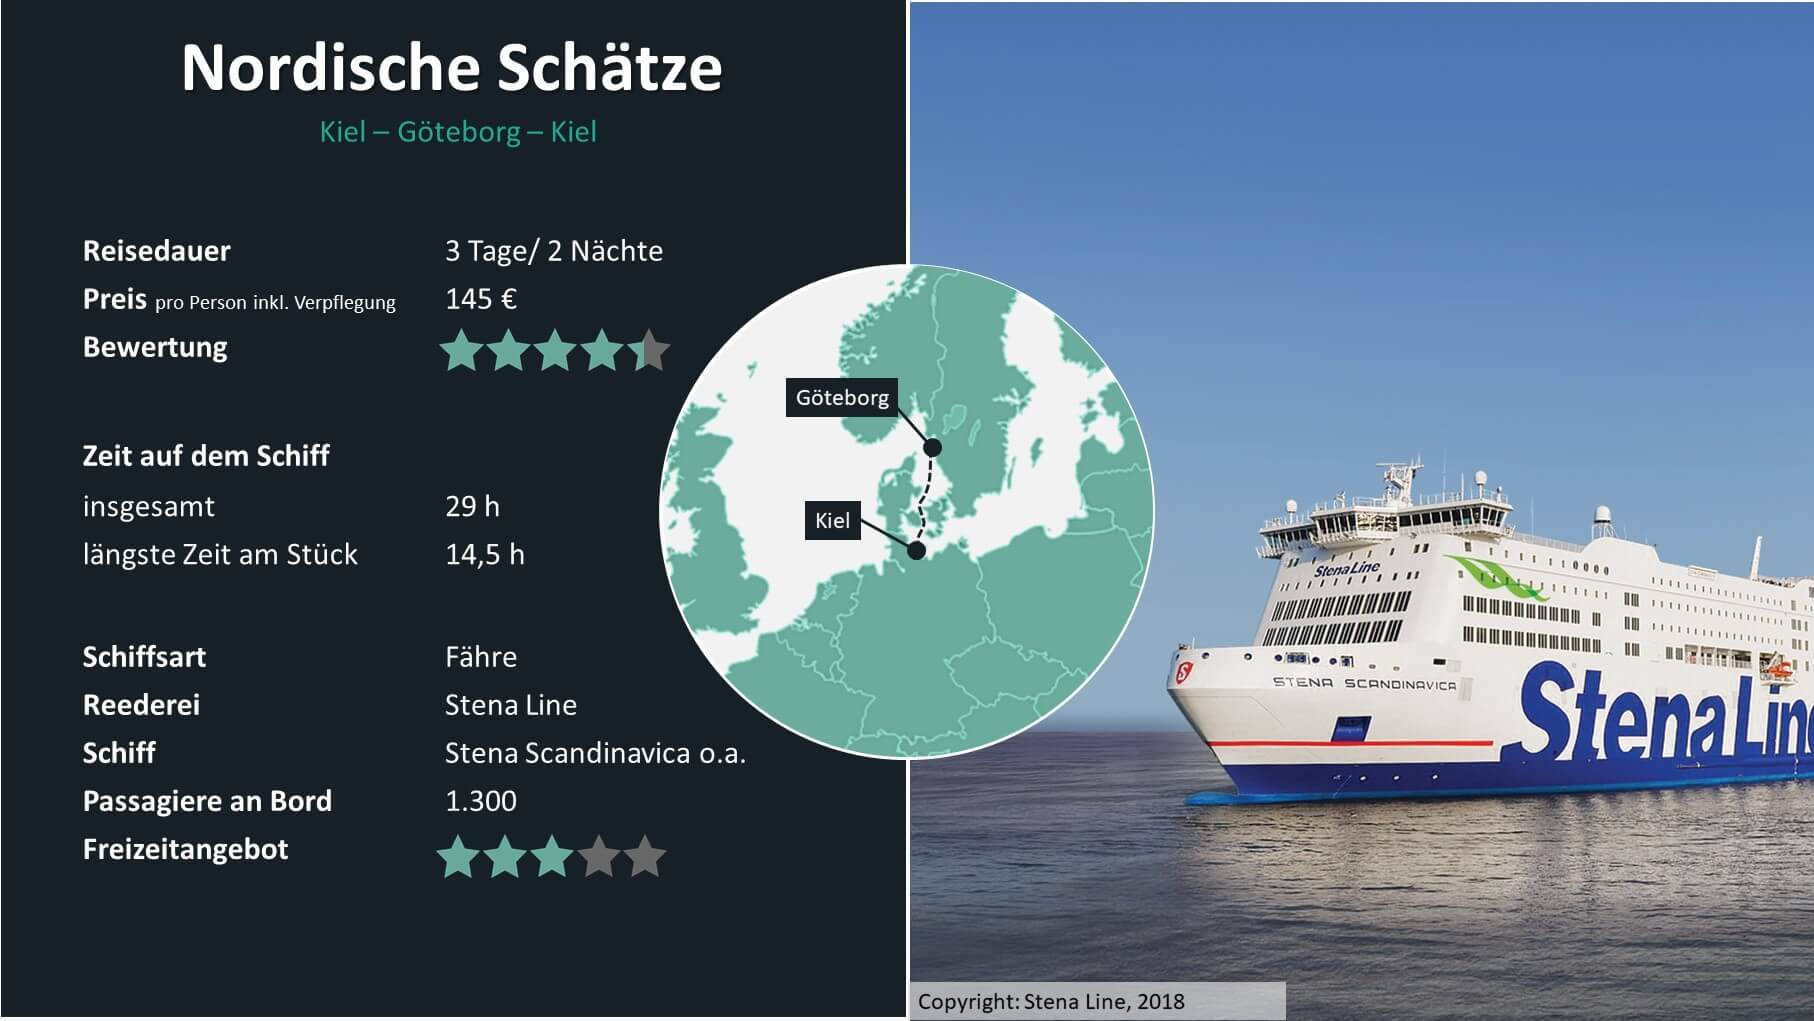 Minikreuzfahrt Kiel - Göteborg - Kiel